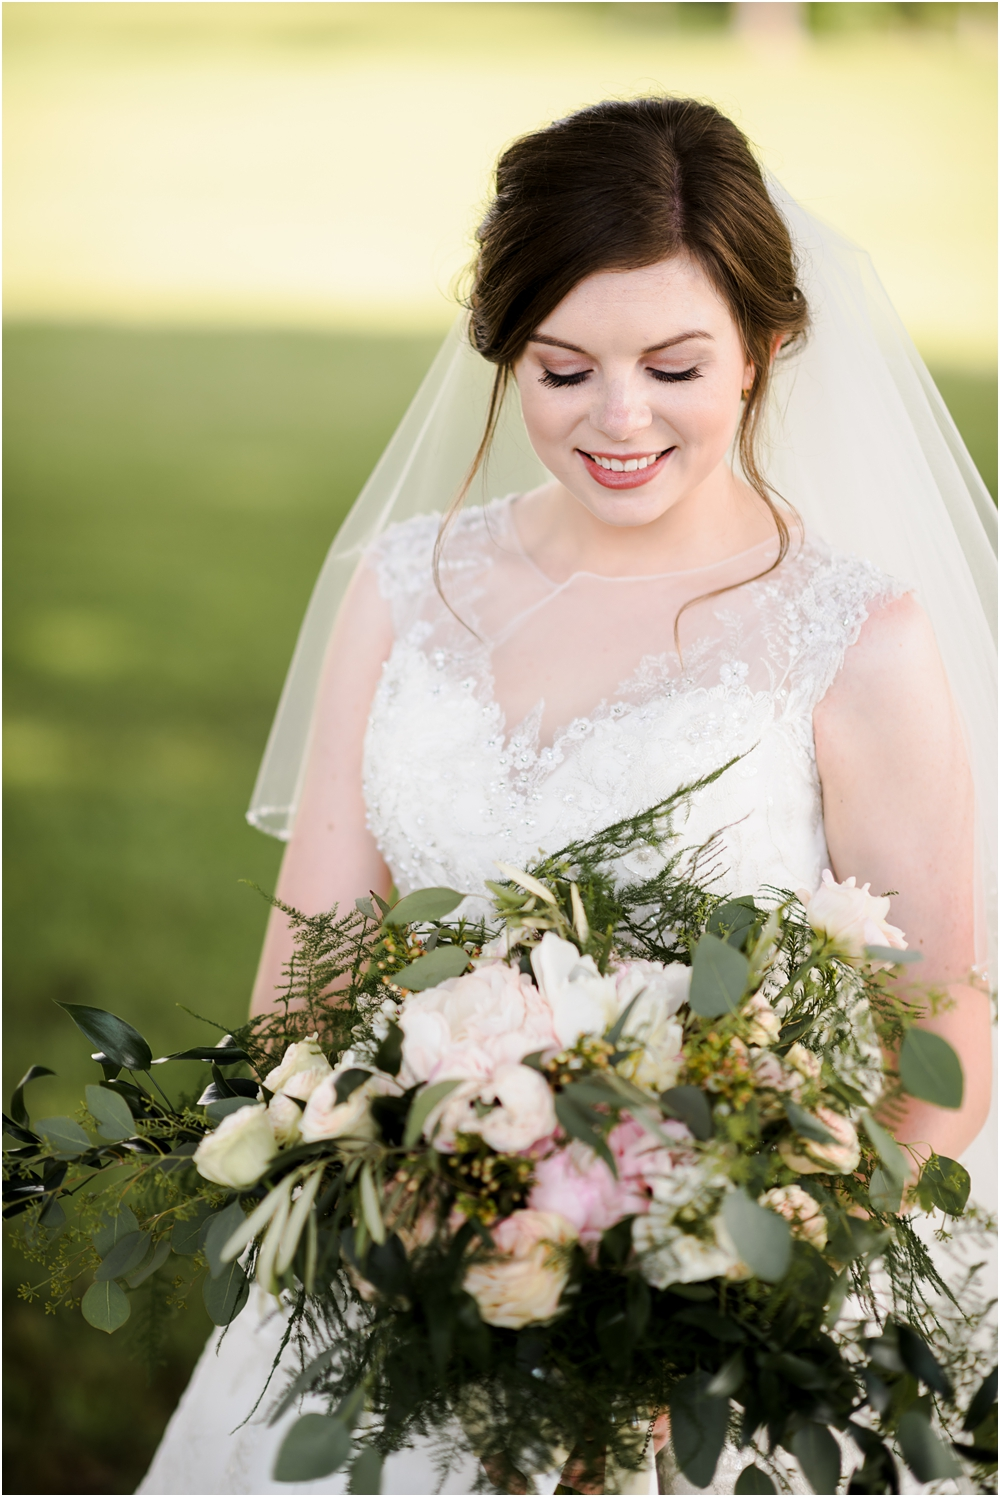 marianna-florida-wedding-photographer-kiersten-grant-83.jpg